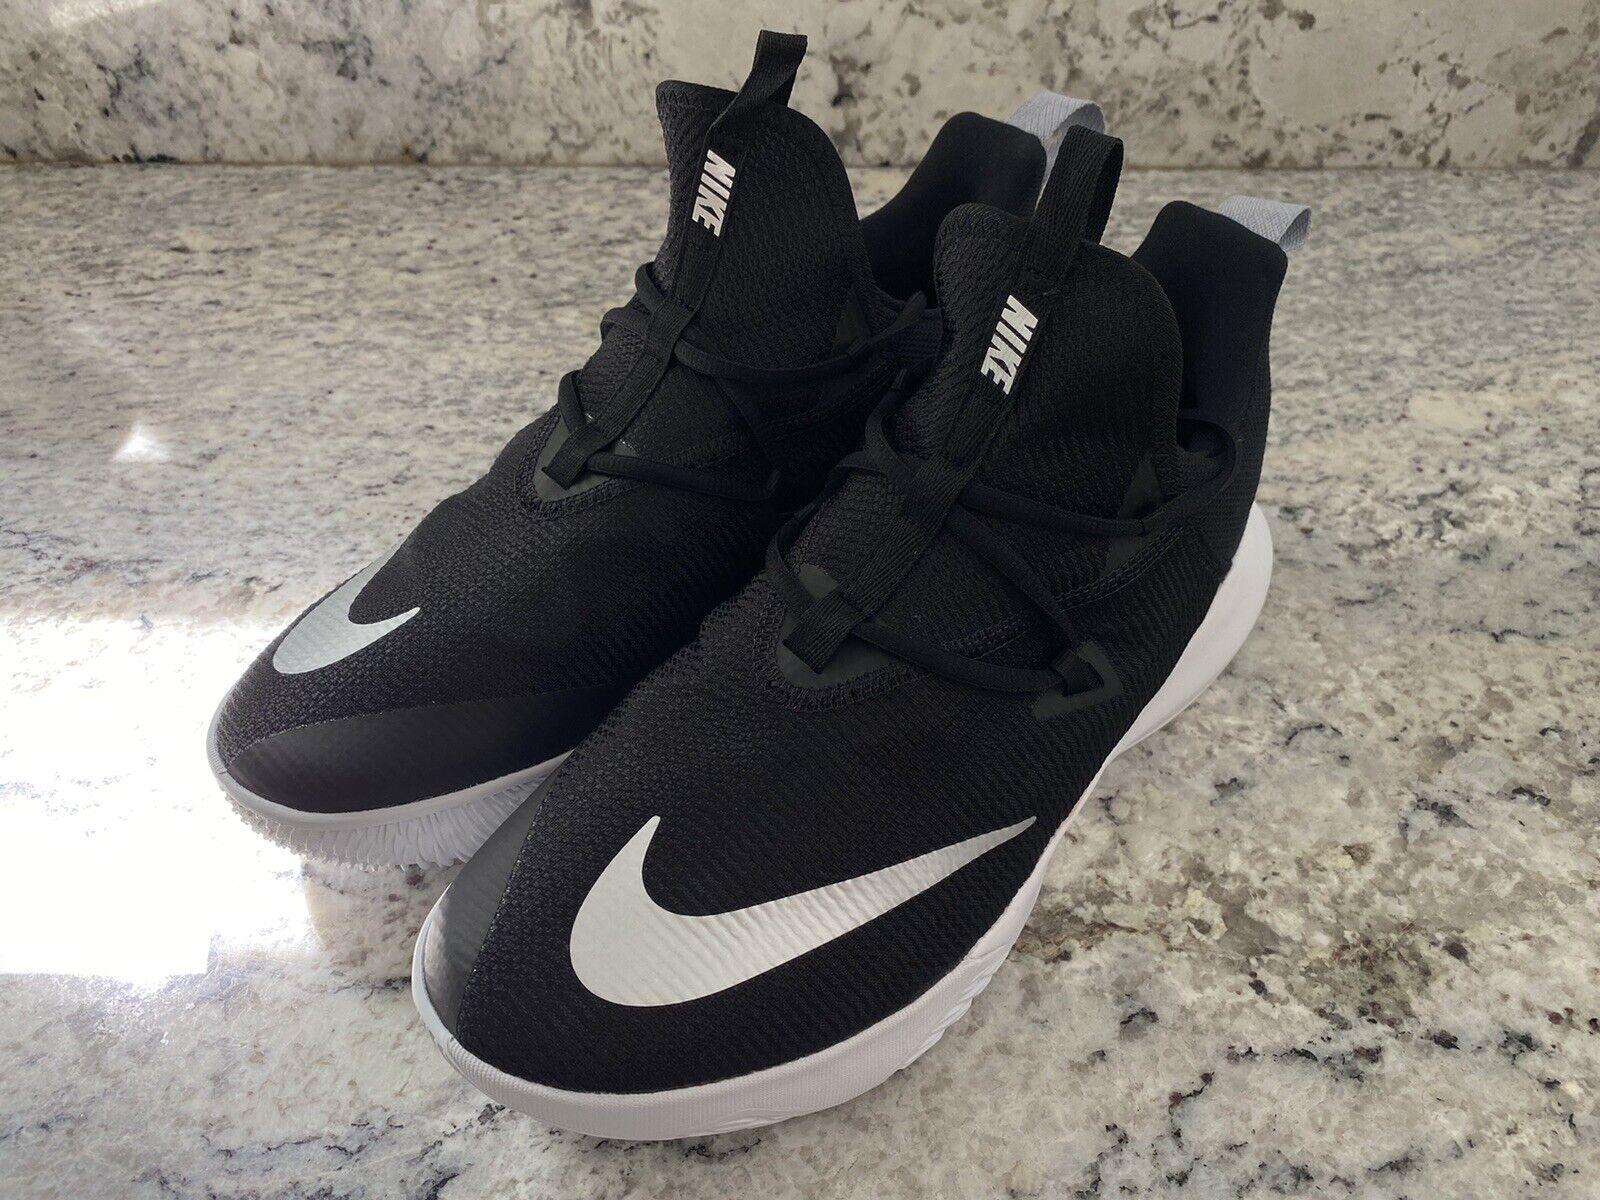 Nike Zoom Shift купить на eBay в